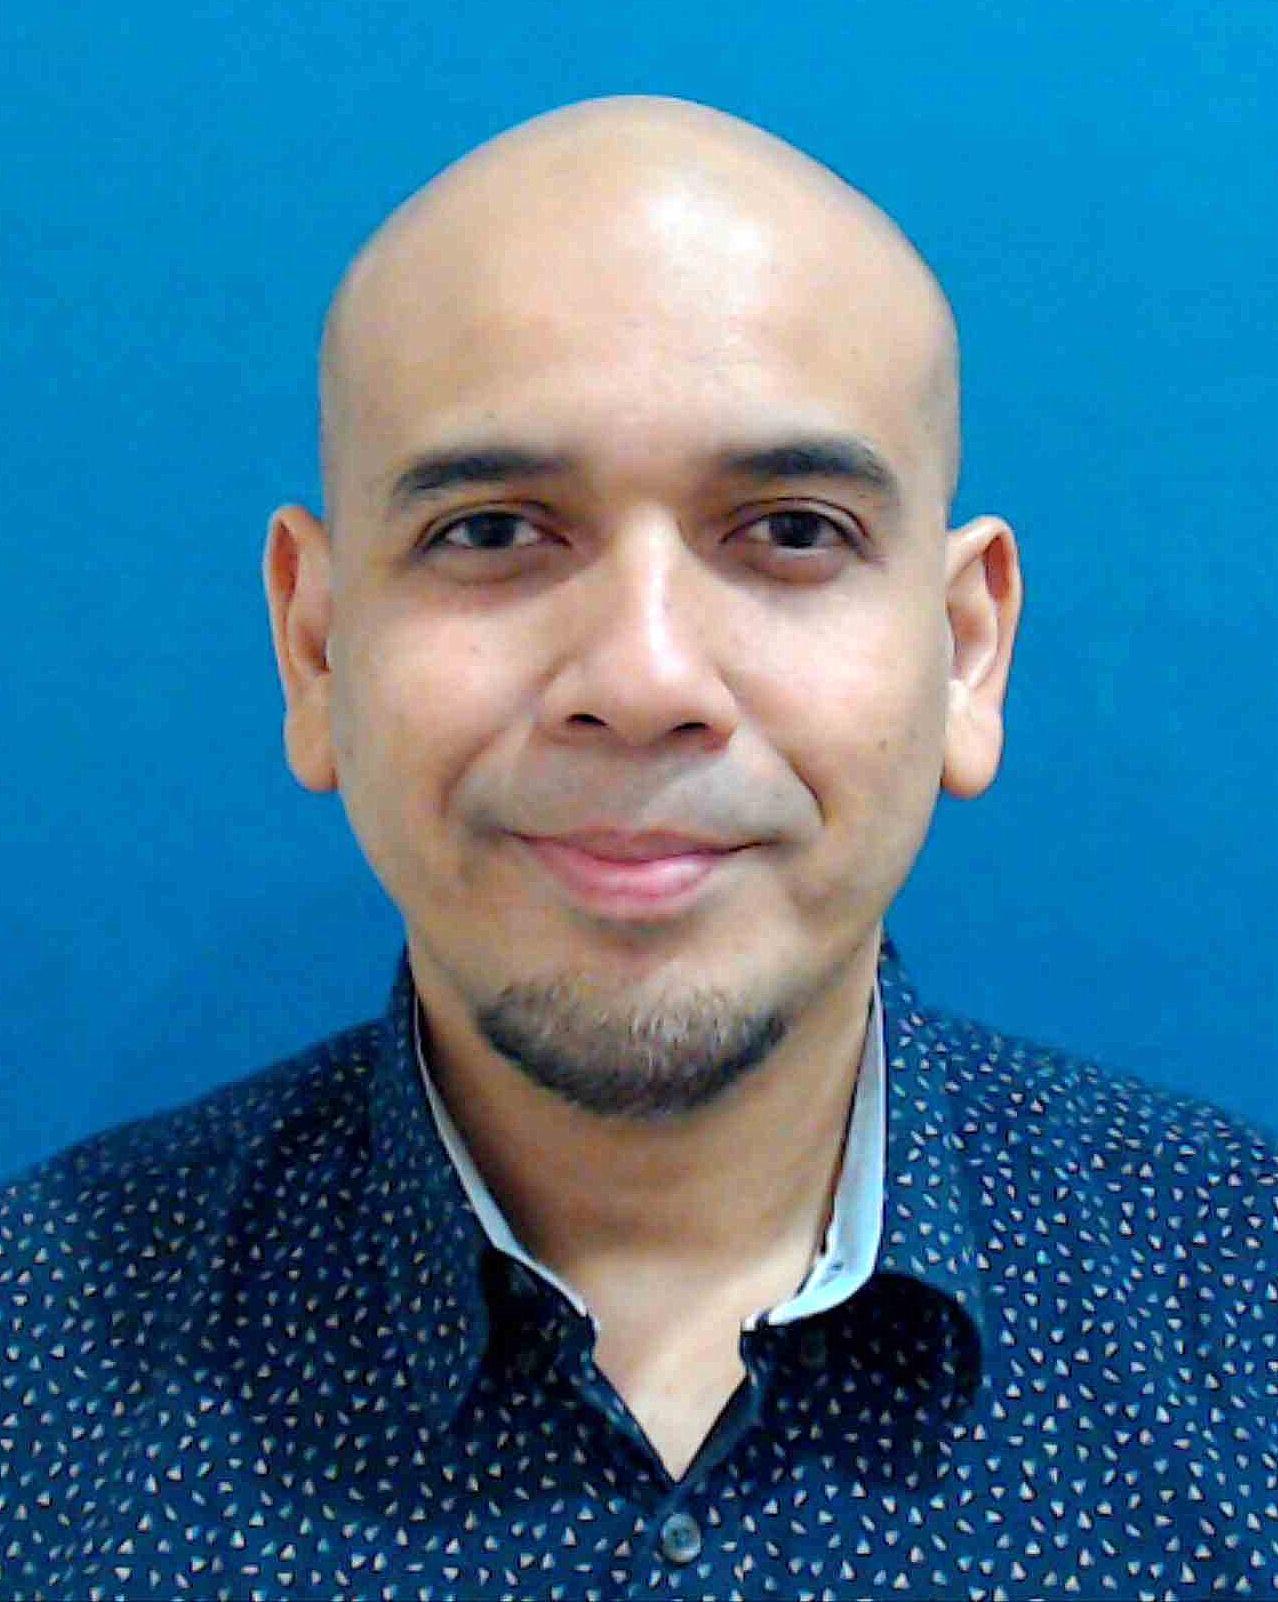 Mohd. Fadly Bin Mohd. Noor